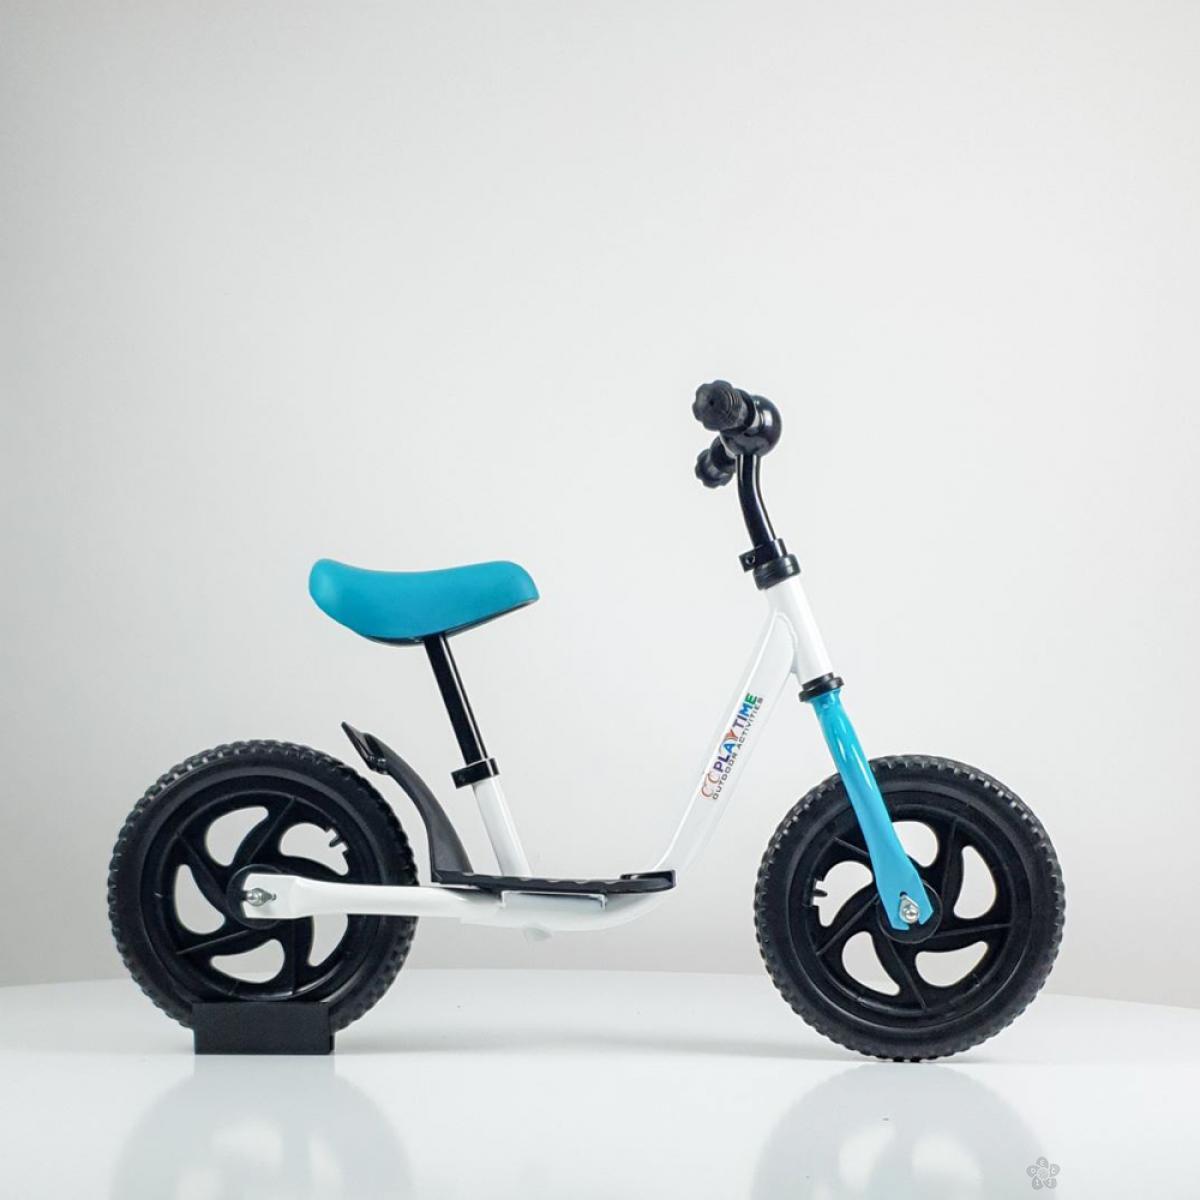 Balans bicikl model 754 plavi